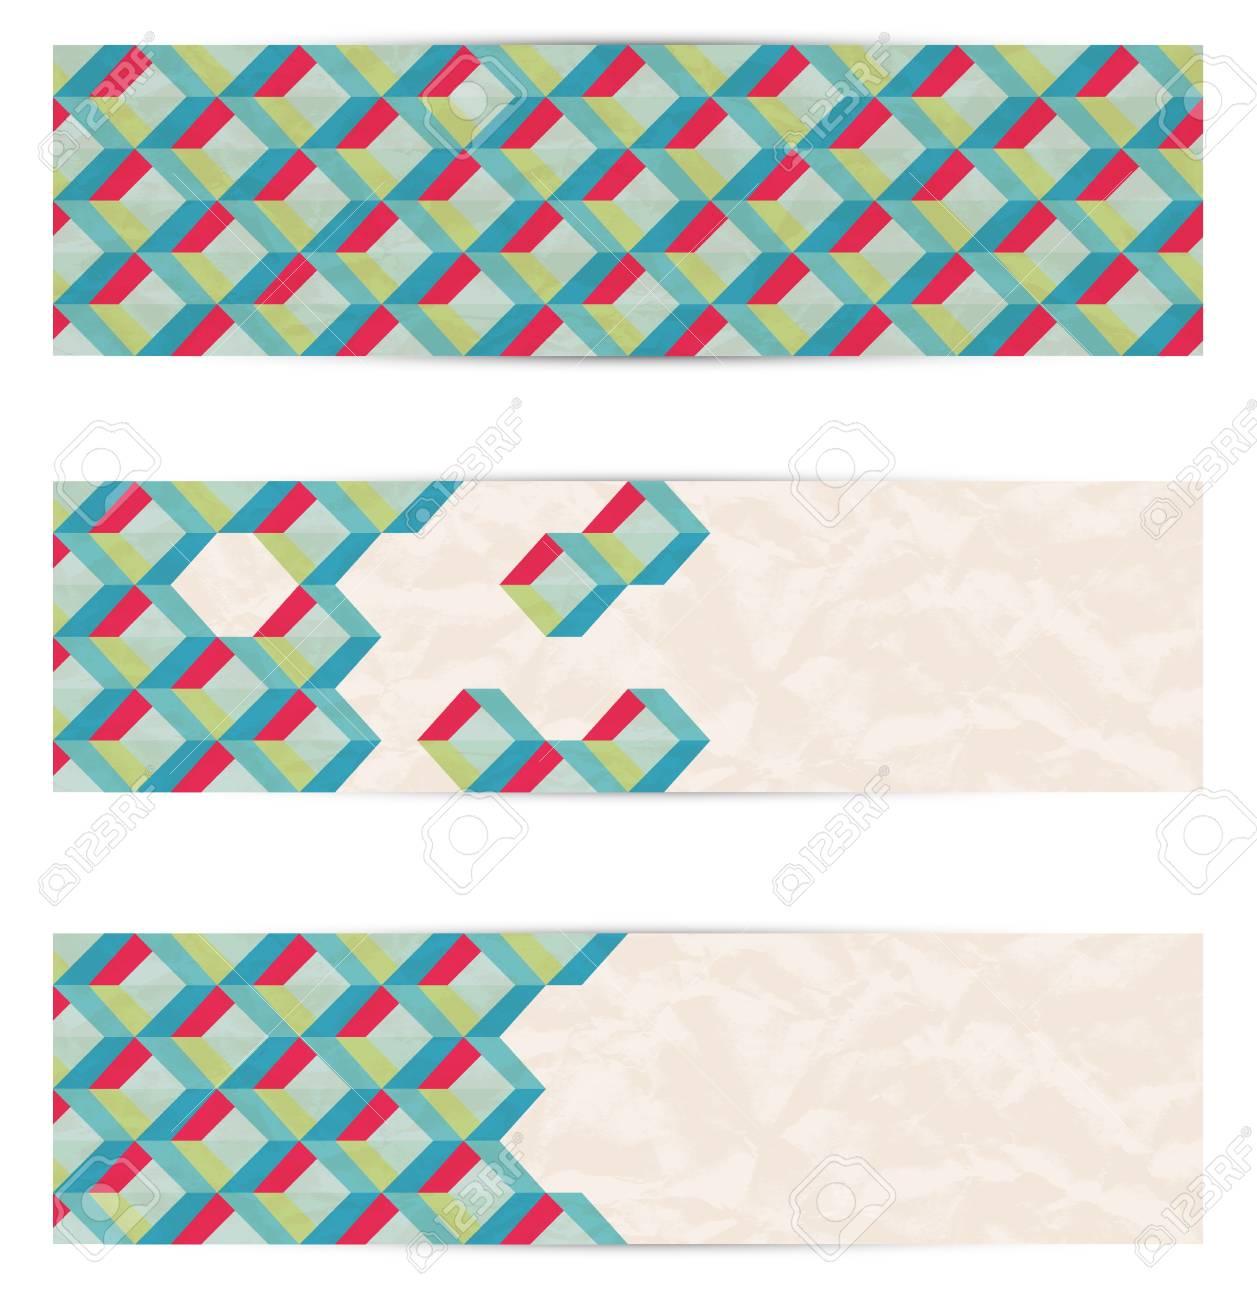 Retor mosaic web banners  Vector Stock Vector - 18428892